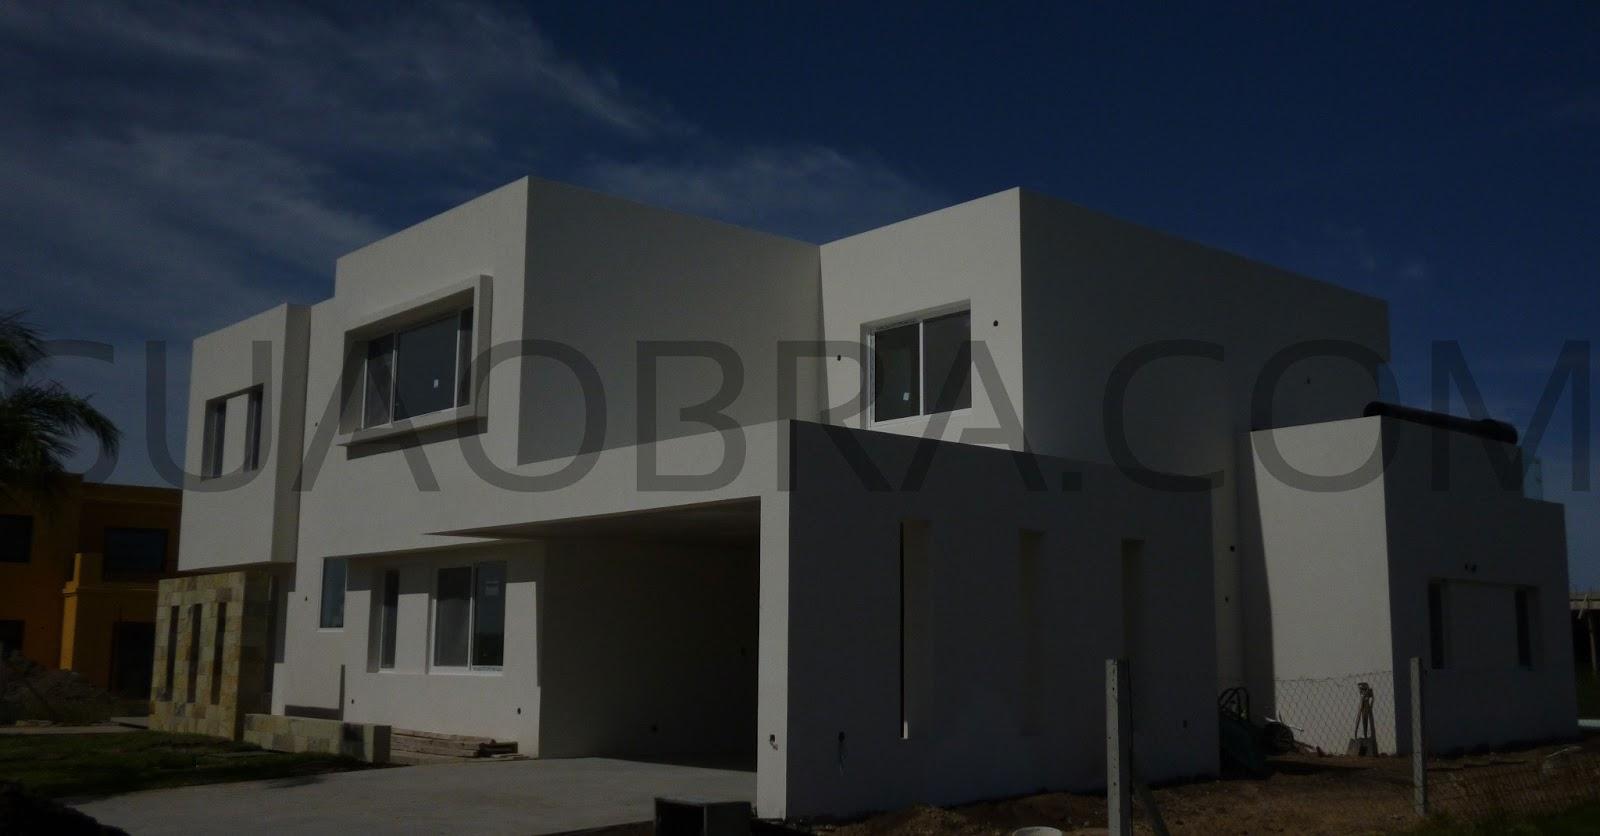 Blanco plus medio revestimiento pl stico para paredes for Revestimiento plastico para paredes